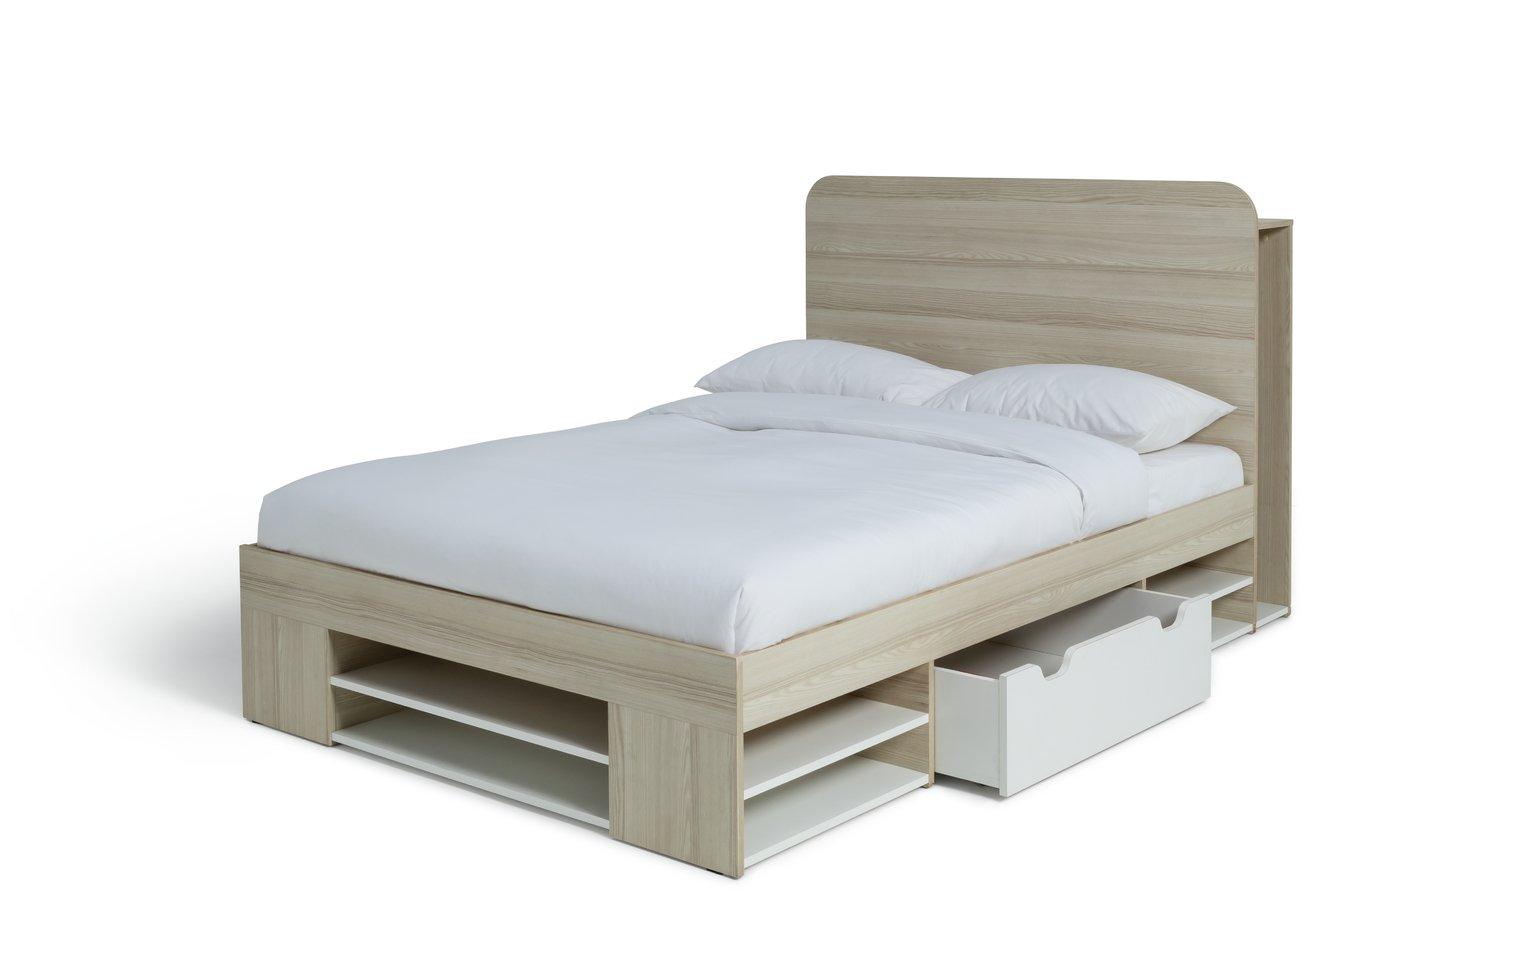 Argos Home Pico Double Bed Frame - Two Tone